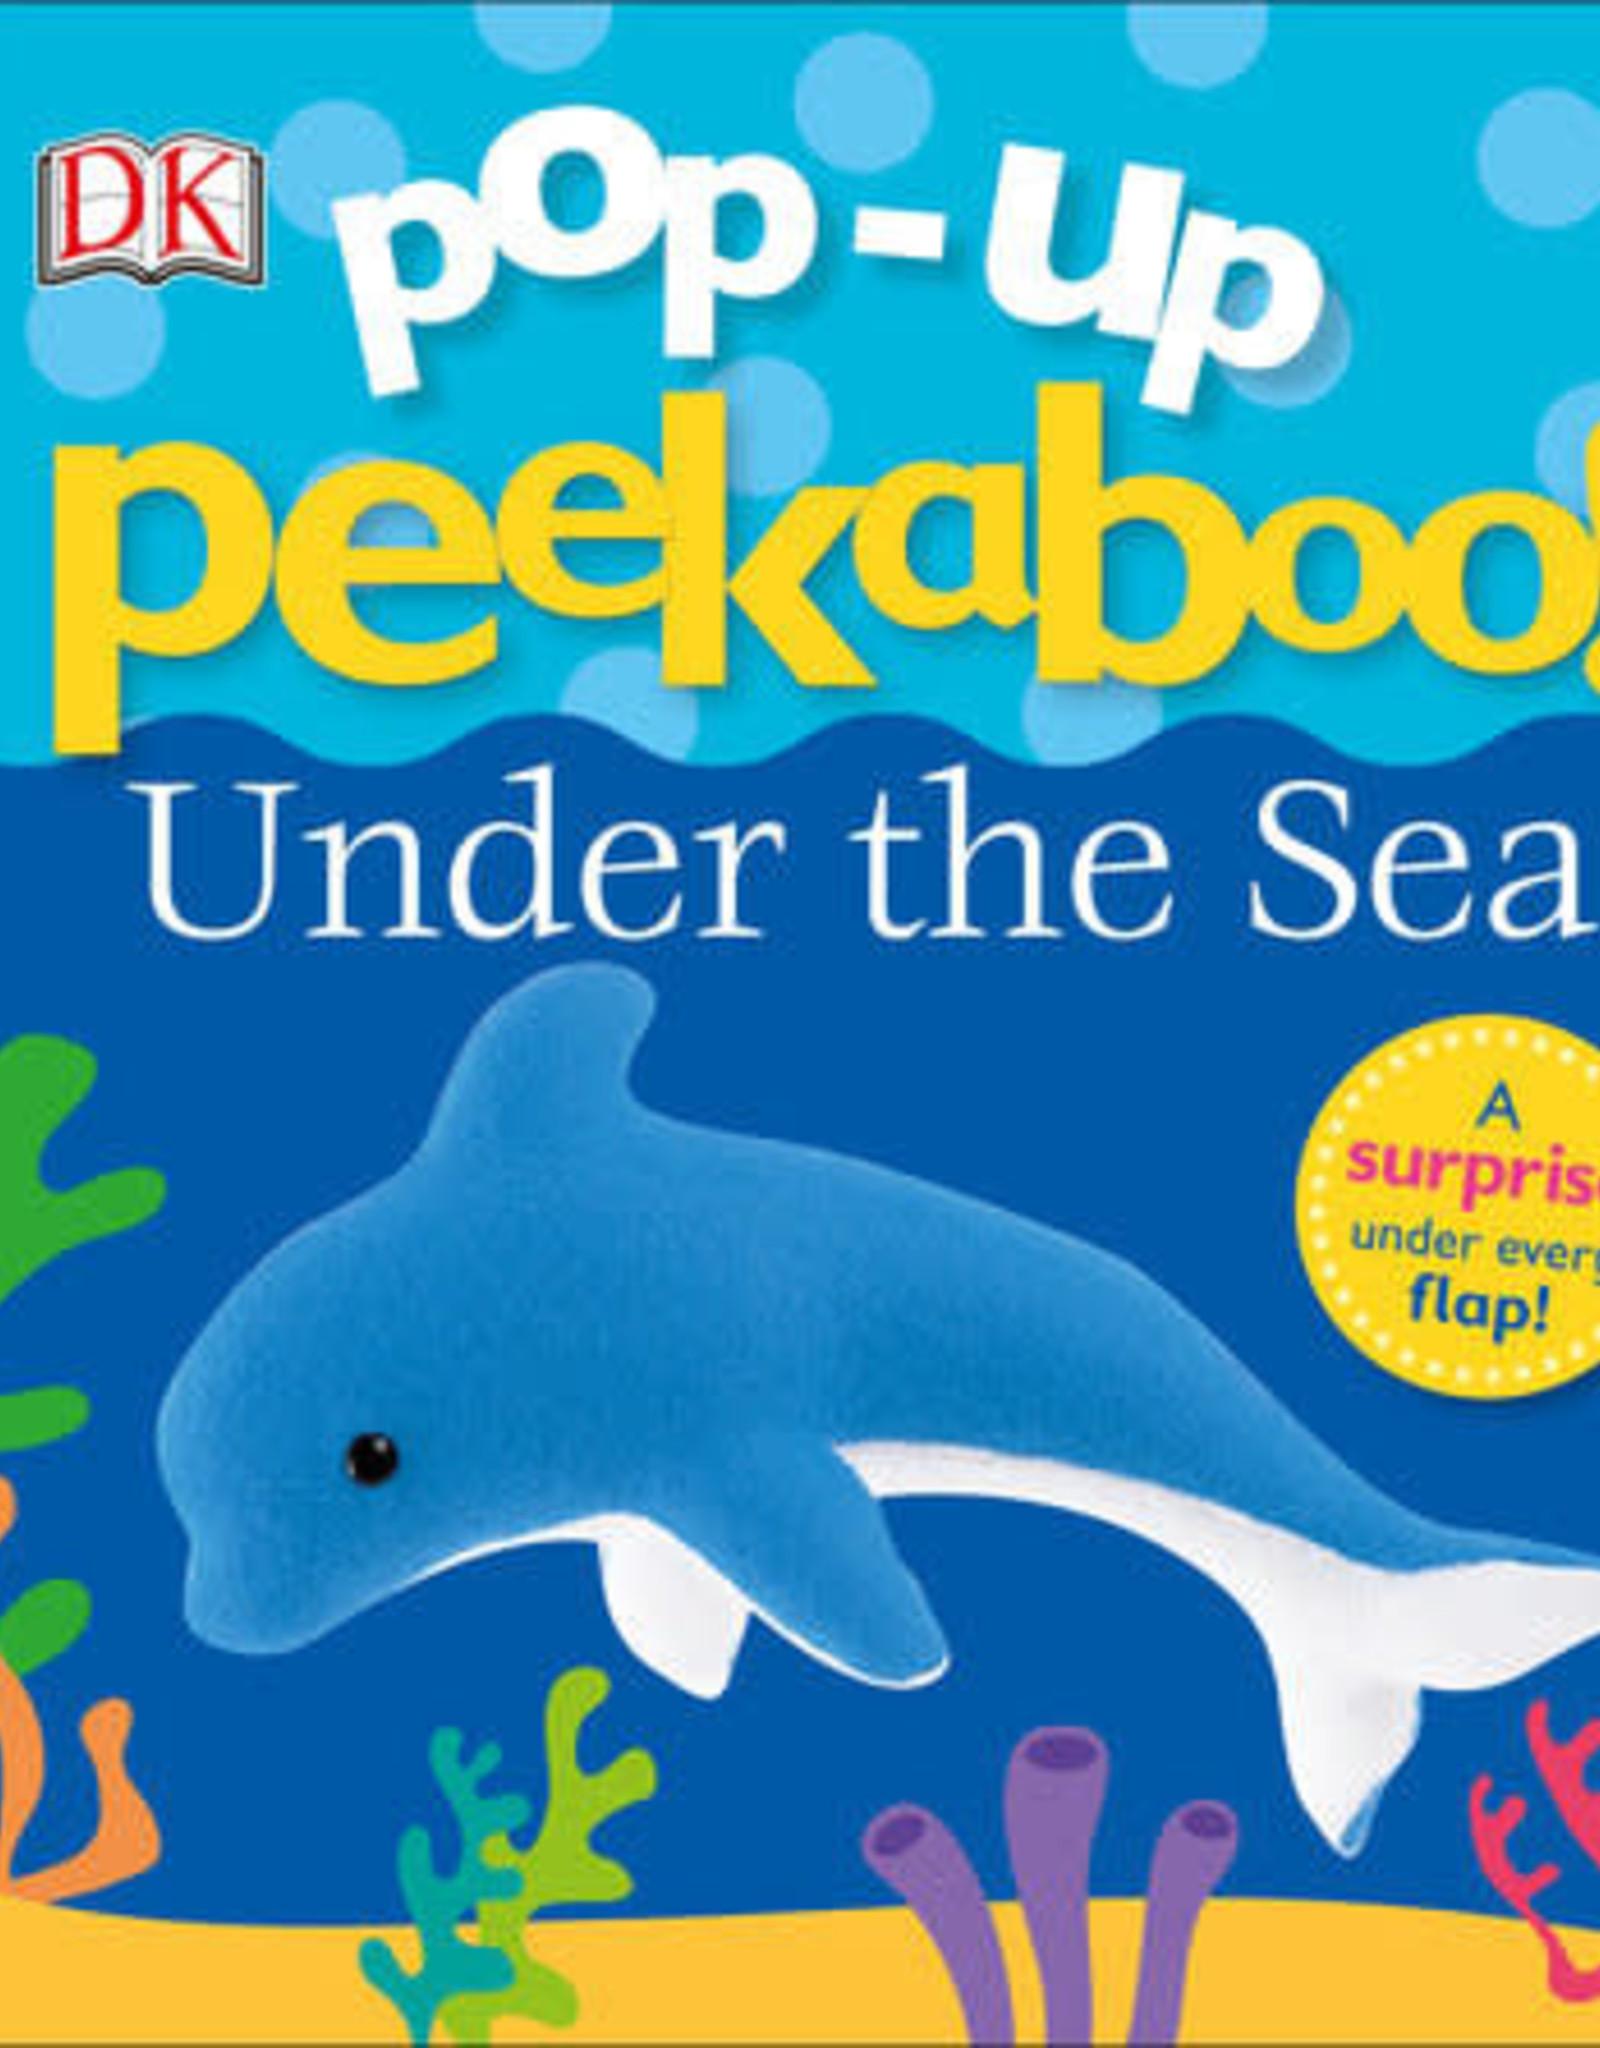 DK Pop Up Under the Sea